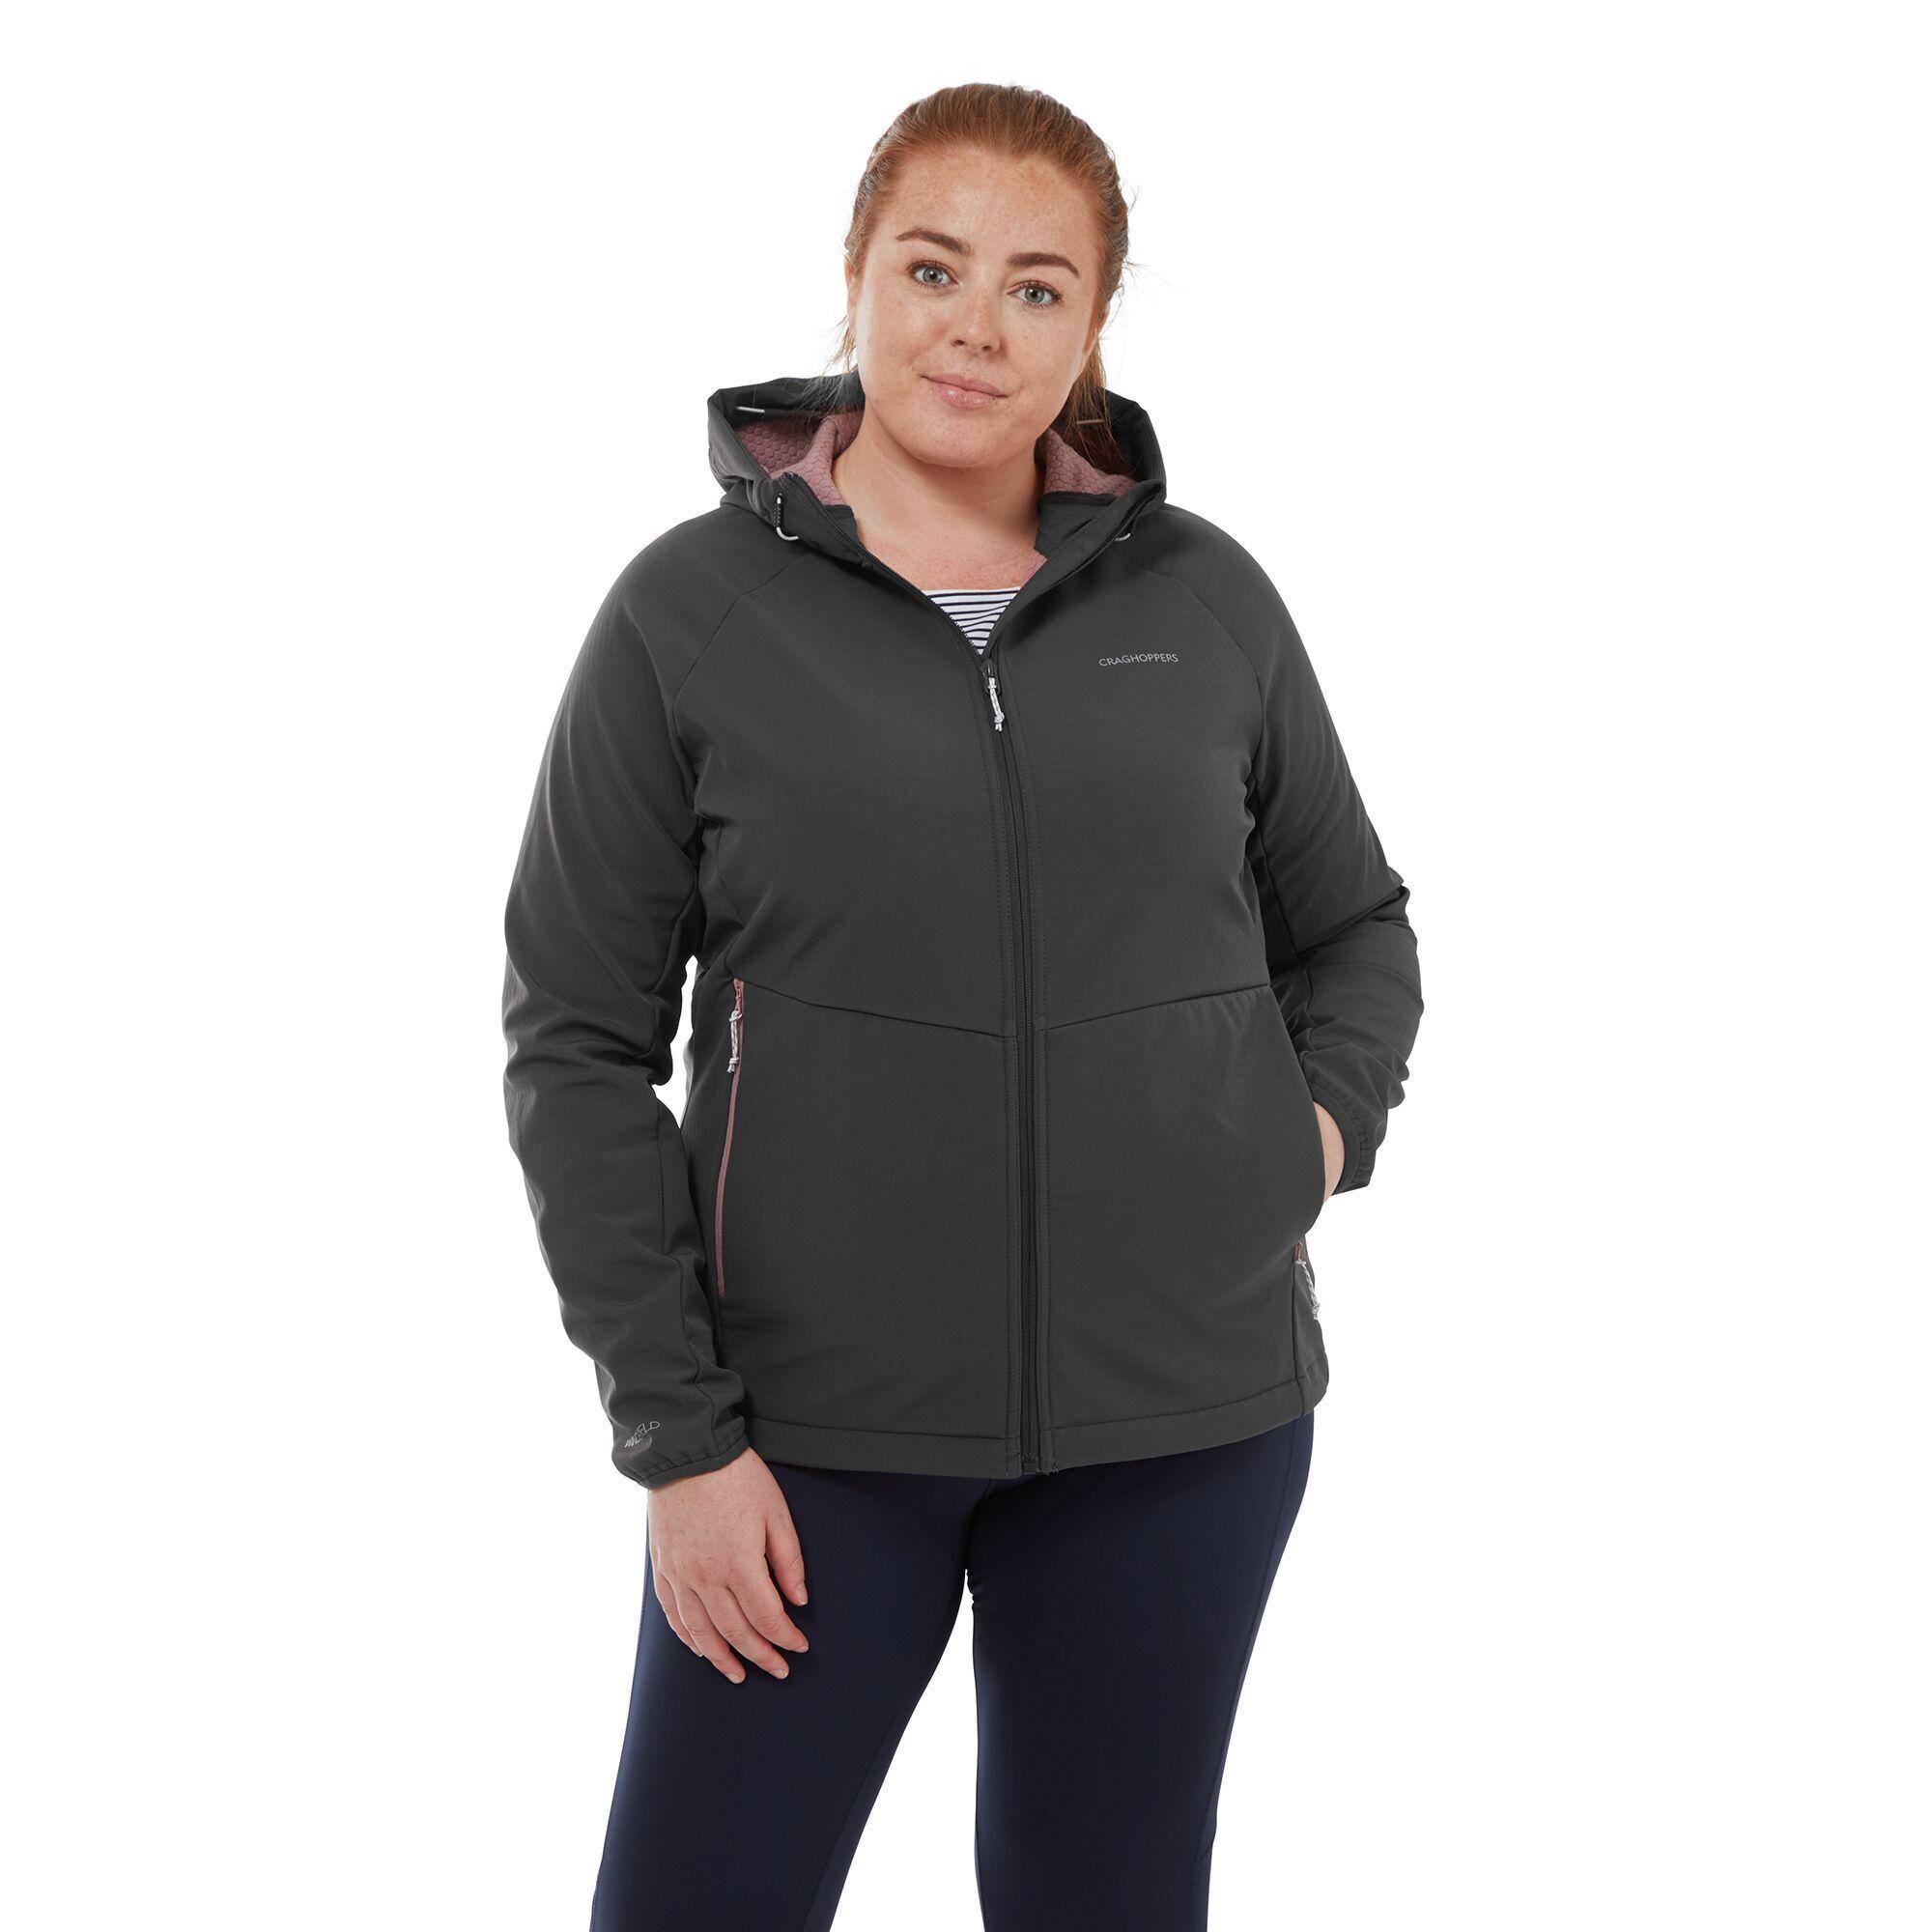 Craghoppers Womens/Ladies Kalti Hooded Jacket (Charcoal)